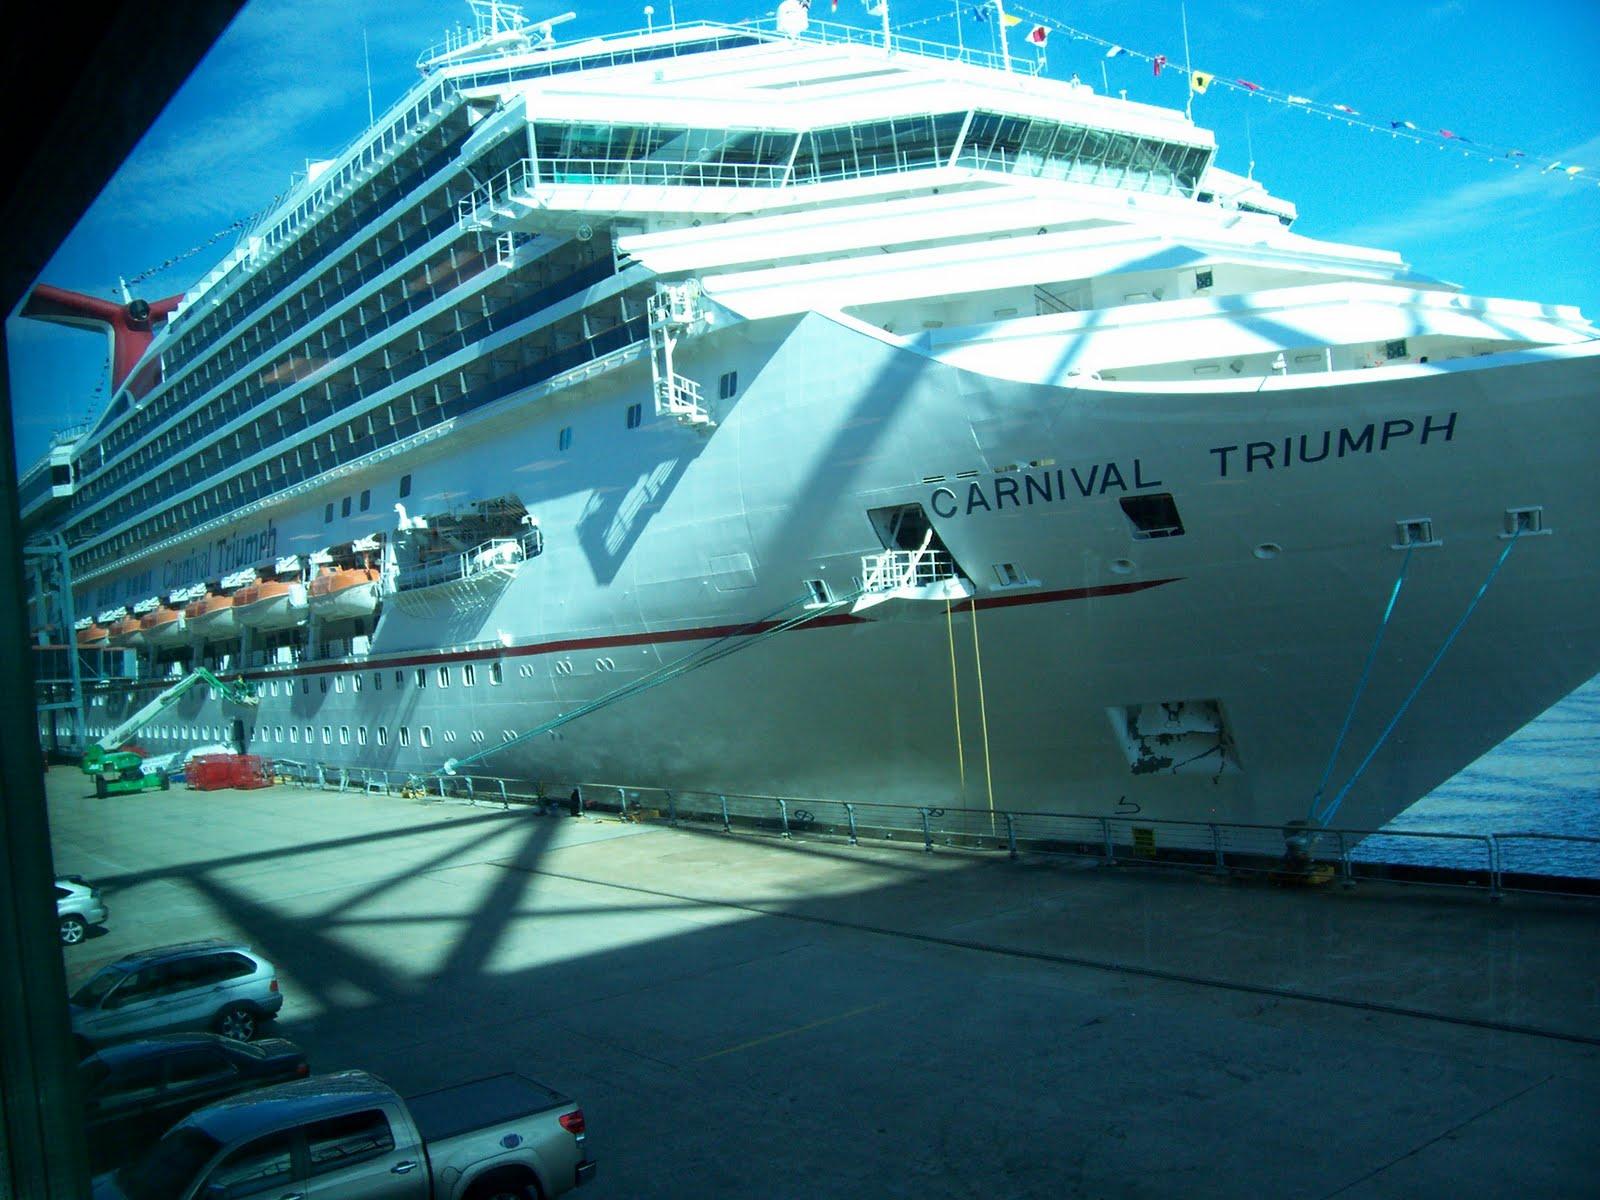 david foster wallace cruise ship essay